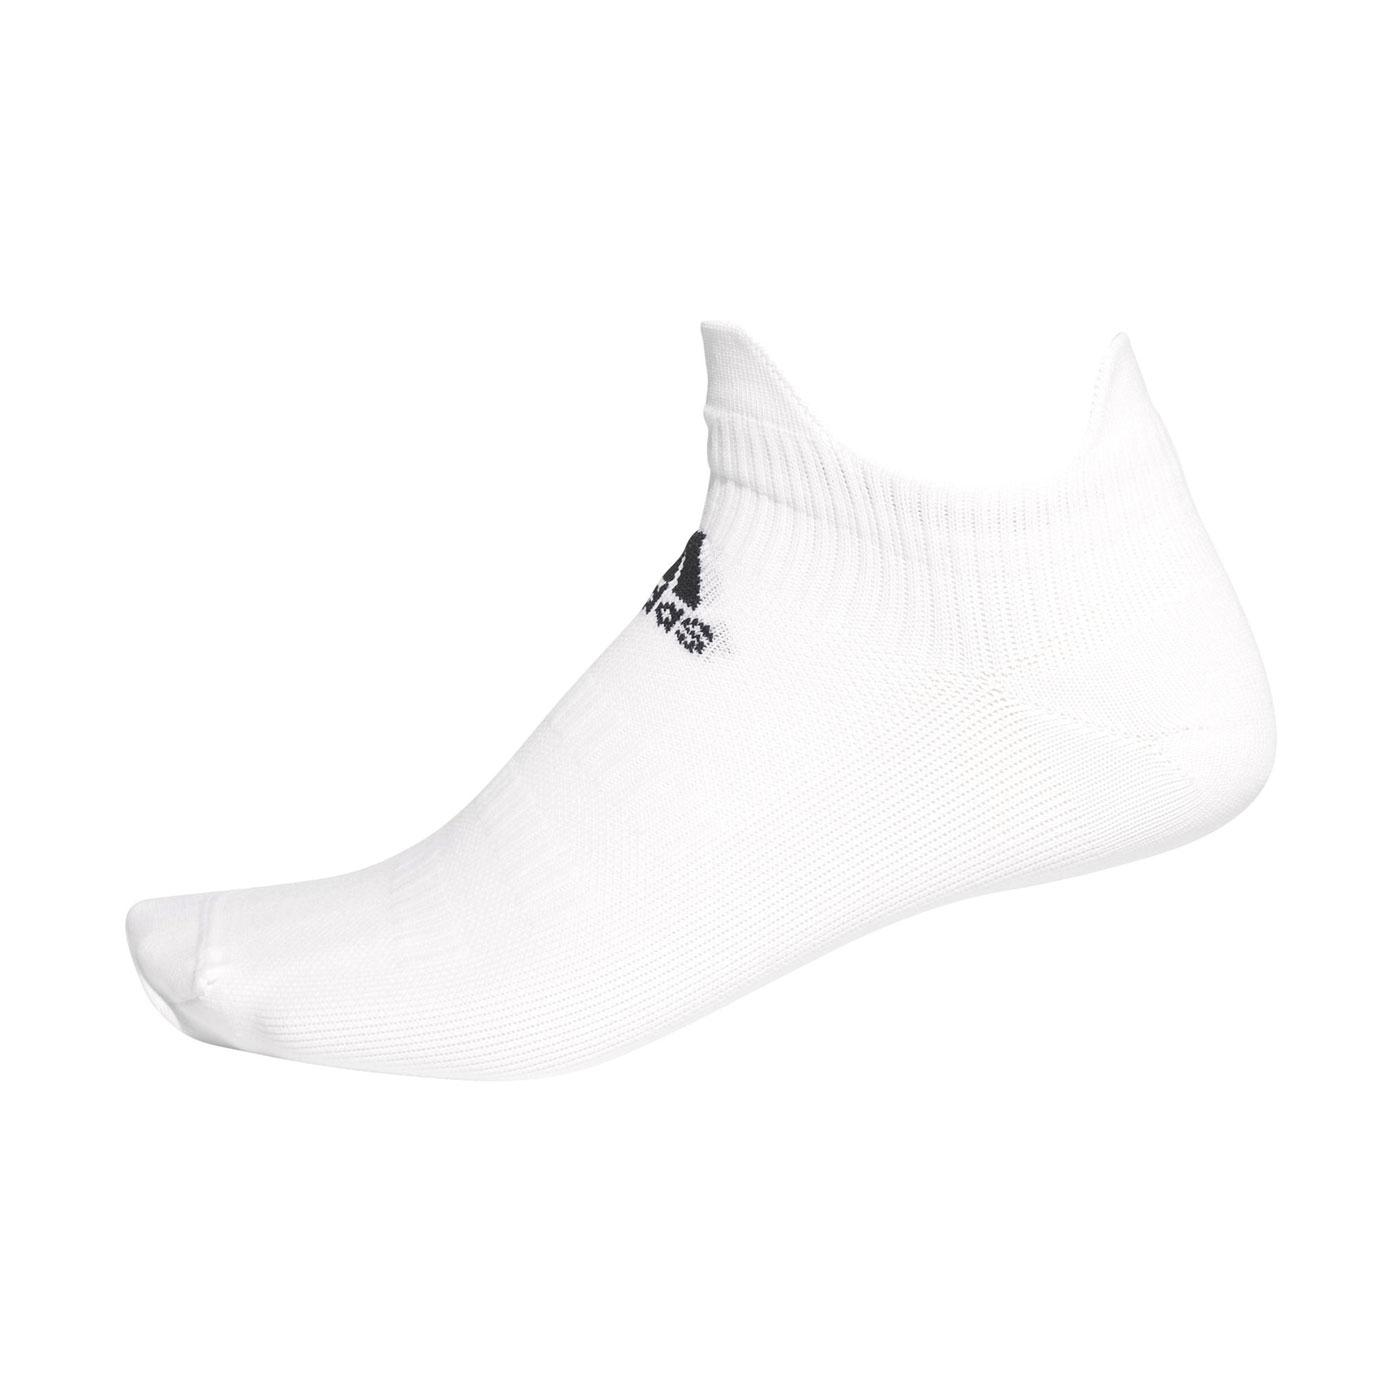 ADIDAS 隱形襪 FK0957 - 白黑